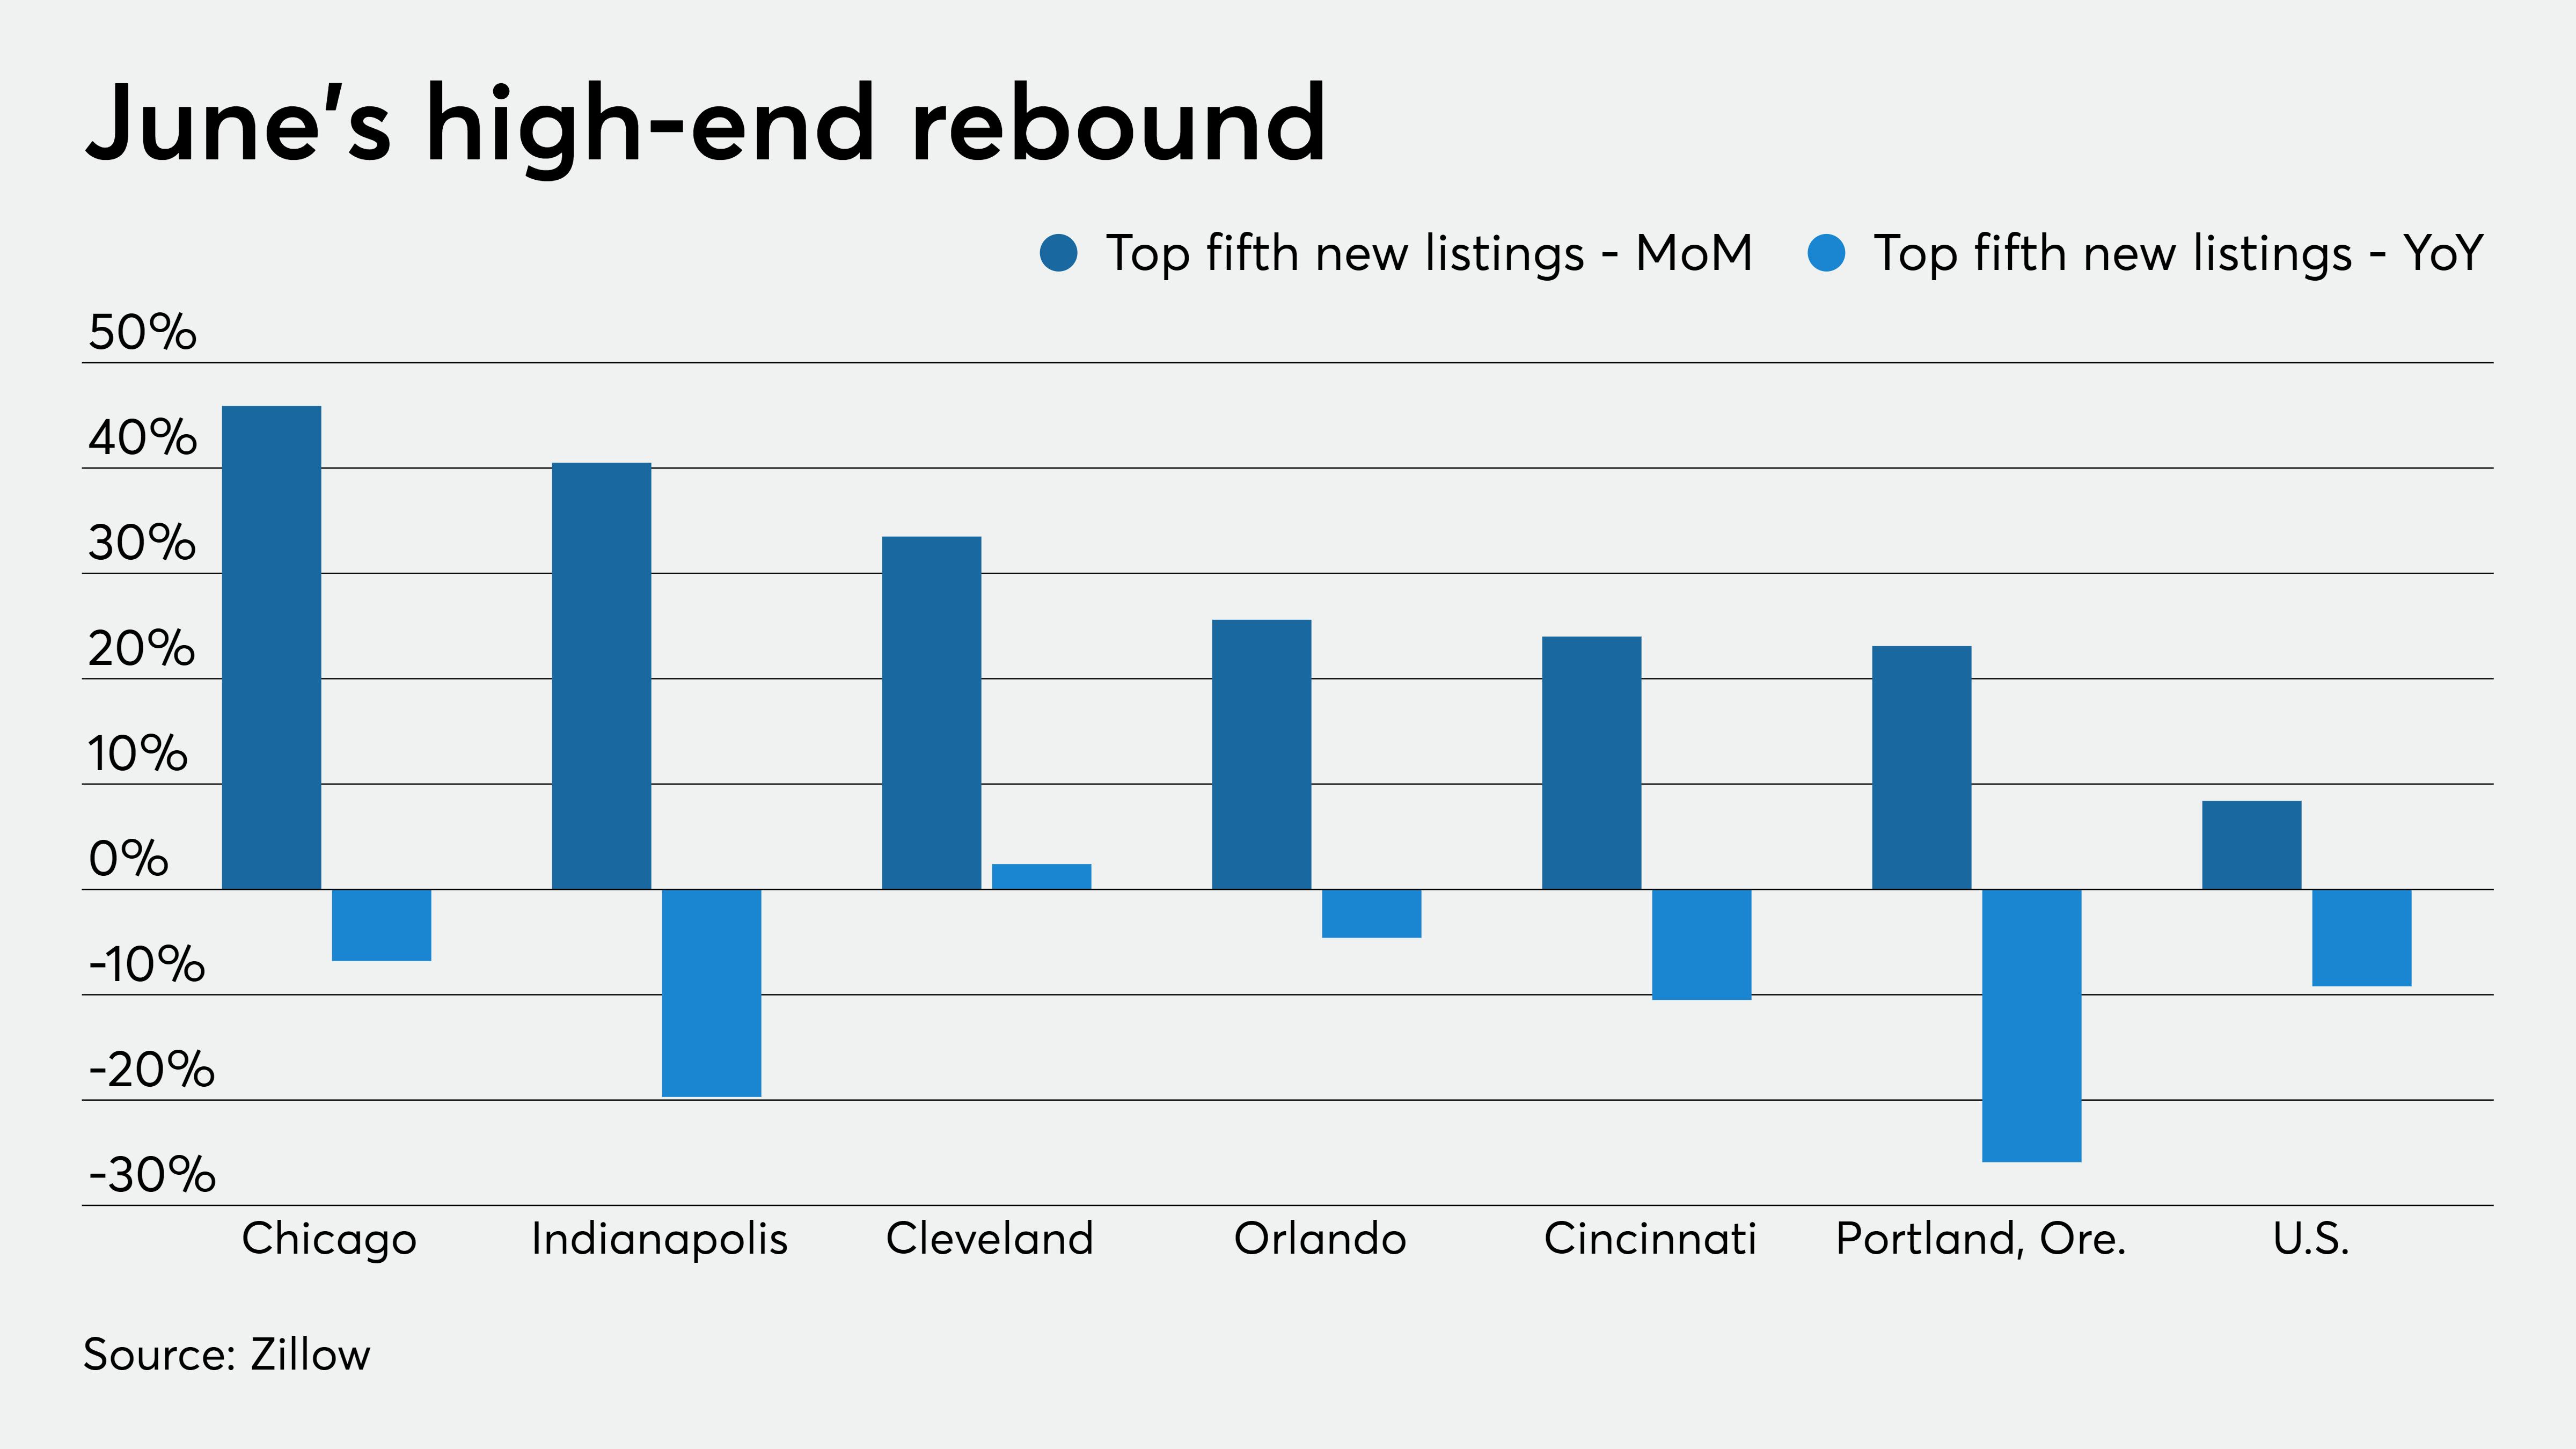 nationalmortgagenews.com - Paul Centopani - High-end housing market rebounds from coronavirus doldrums